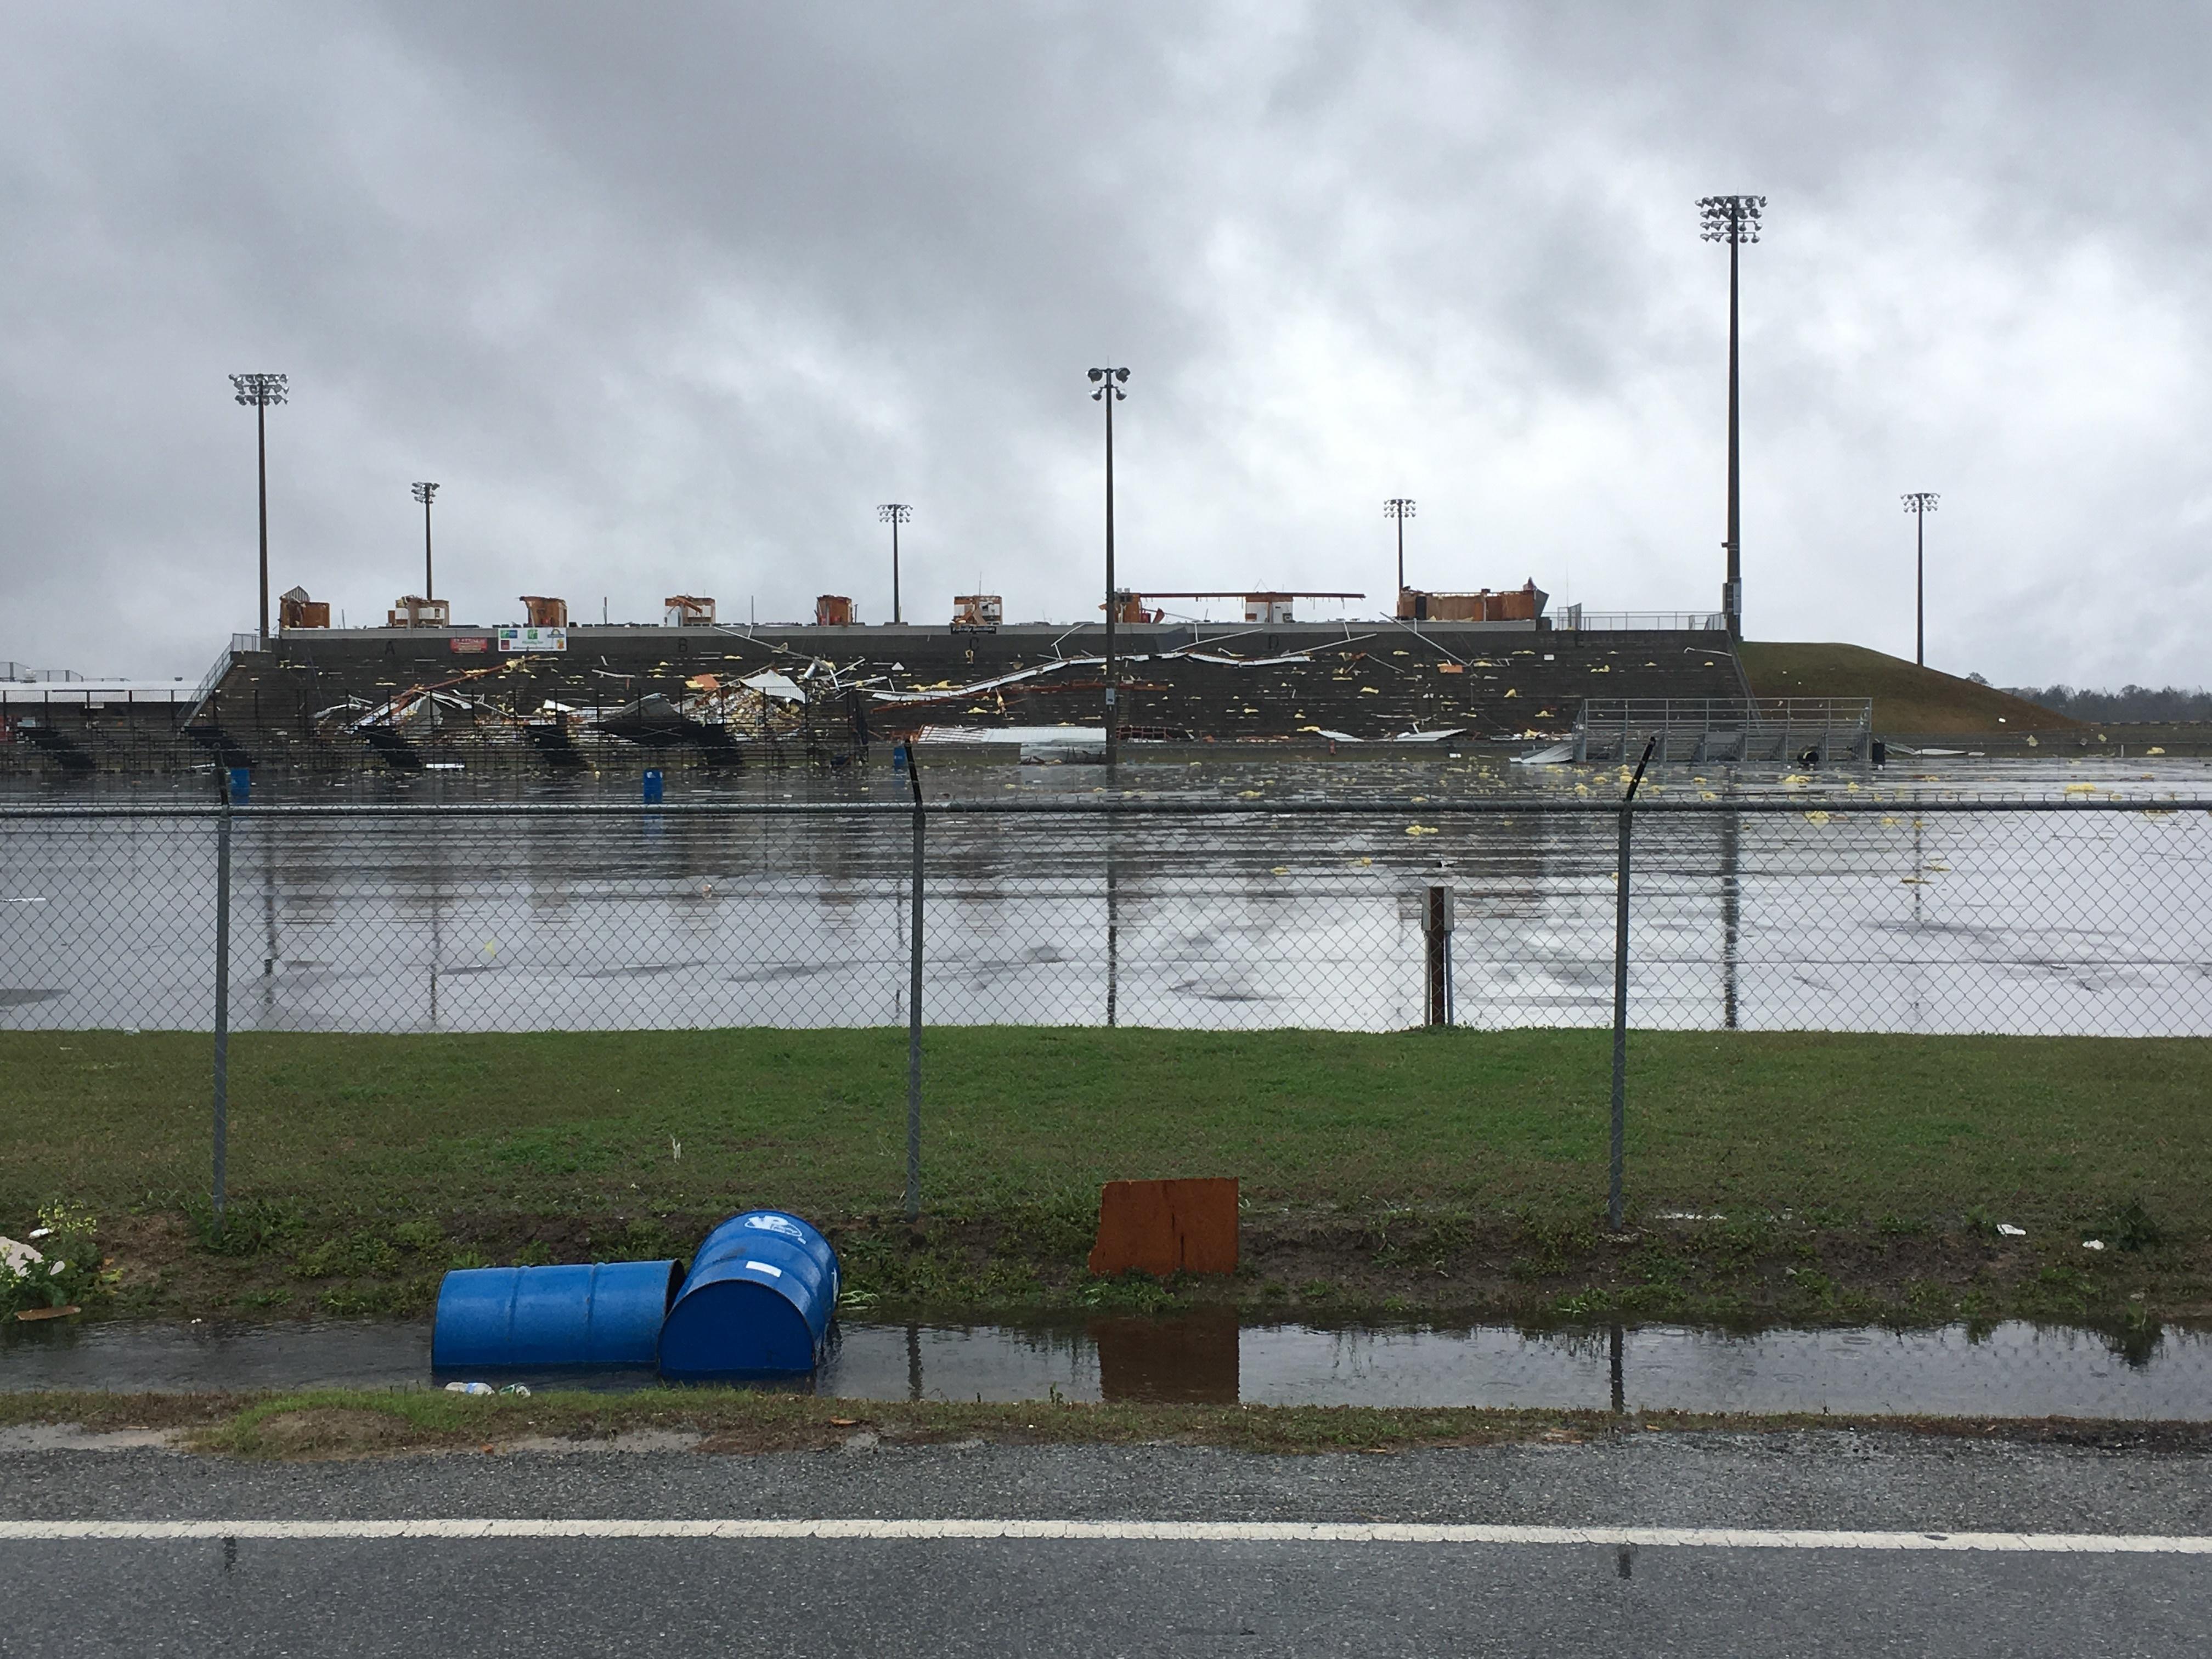 Storm damage is seen at South Georgia Motorsports Park in Cecil, Ga., on Jan. 22, 2017. (AP Photo/Brendan Farrington)